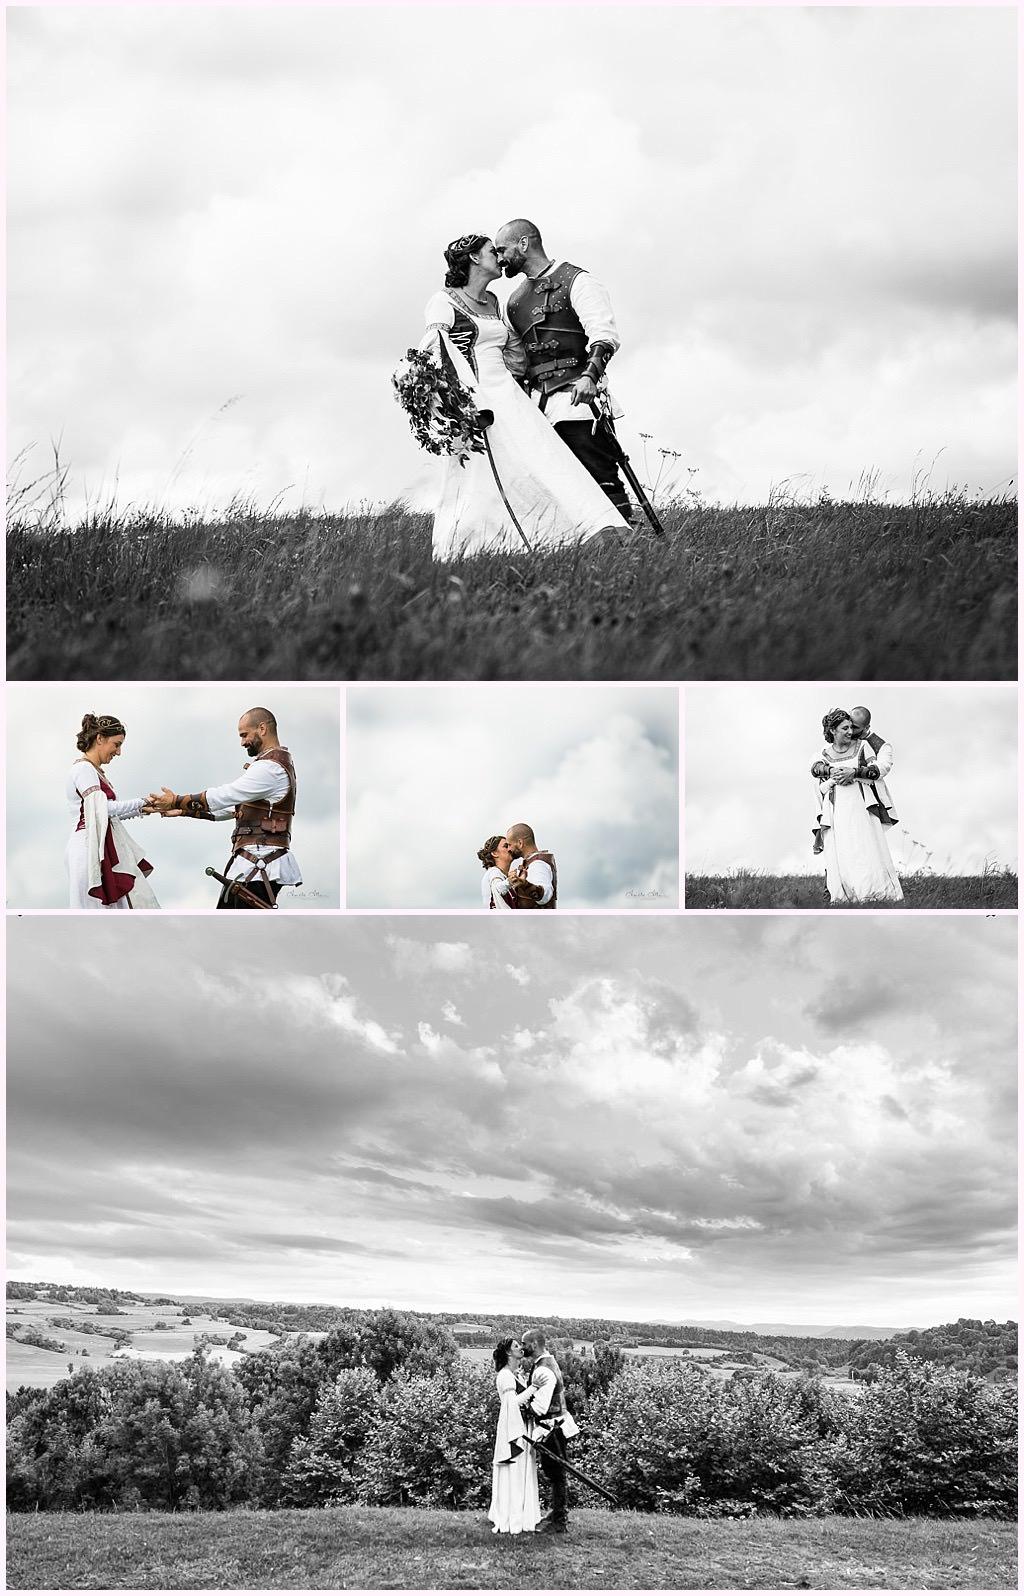 photos de couple mariage en costume photographe mariage medieval nozeroy photographe aurelie allanic